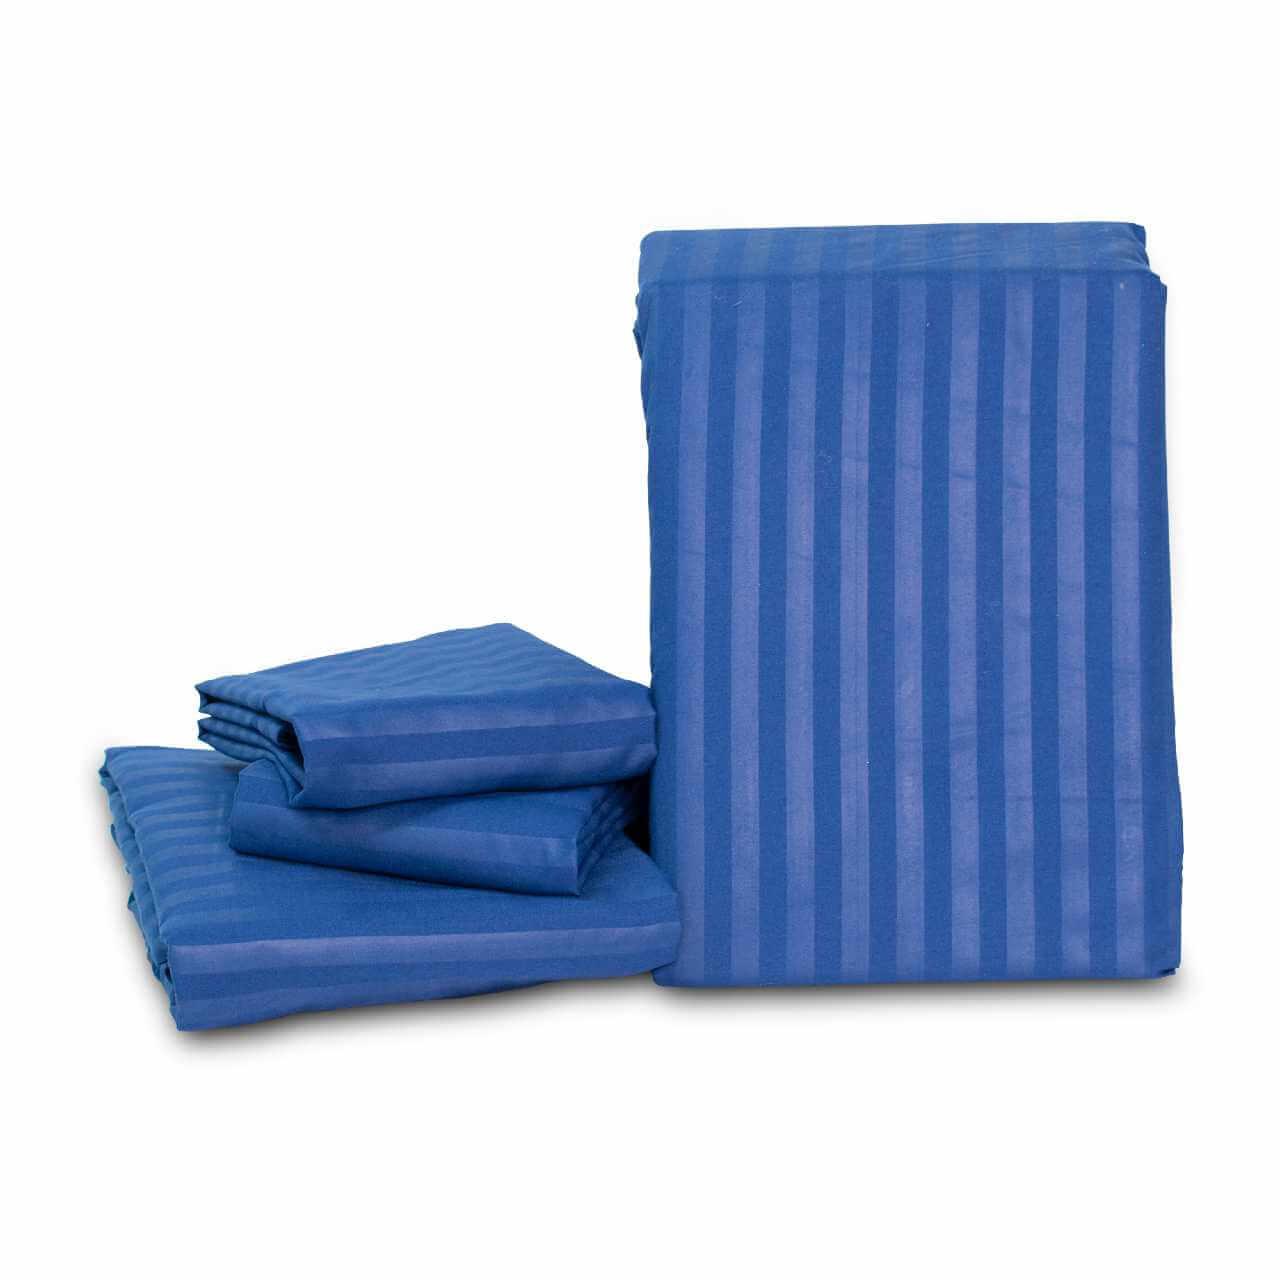 Juego de Sábanas Casa Real Tex Unicolor- Azul Oscuro